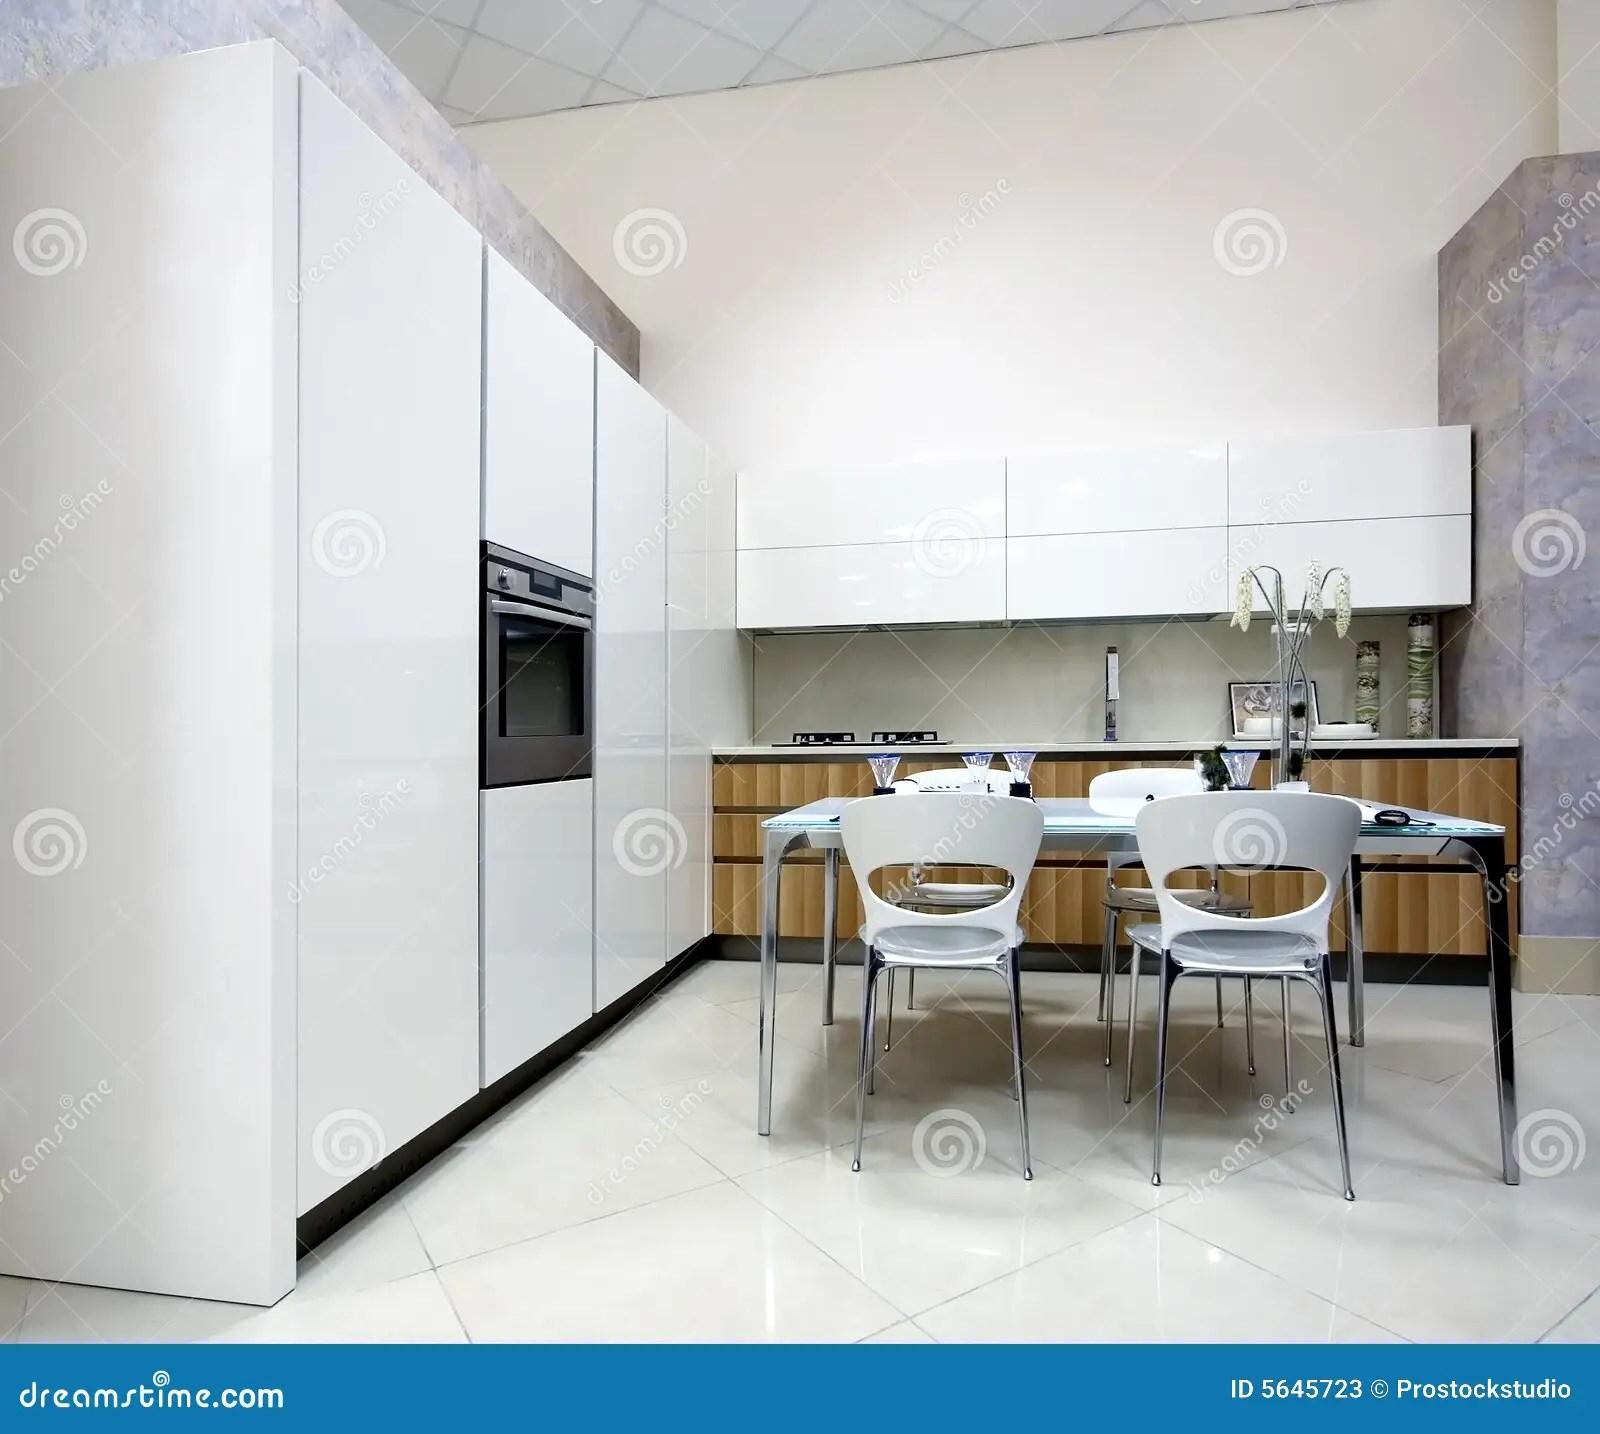 kitchen showrooms kitchens ideas 厨房豪华陈列室库存图片 图片包括有生活 存储 陈列室 厨房 设计 厨房豪华陈列室